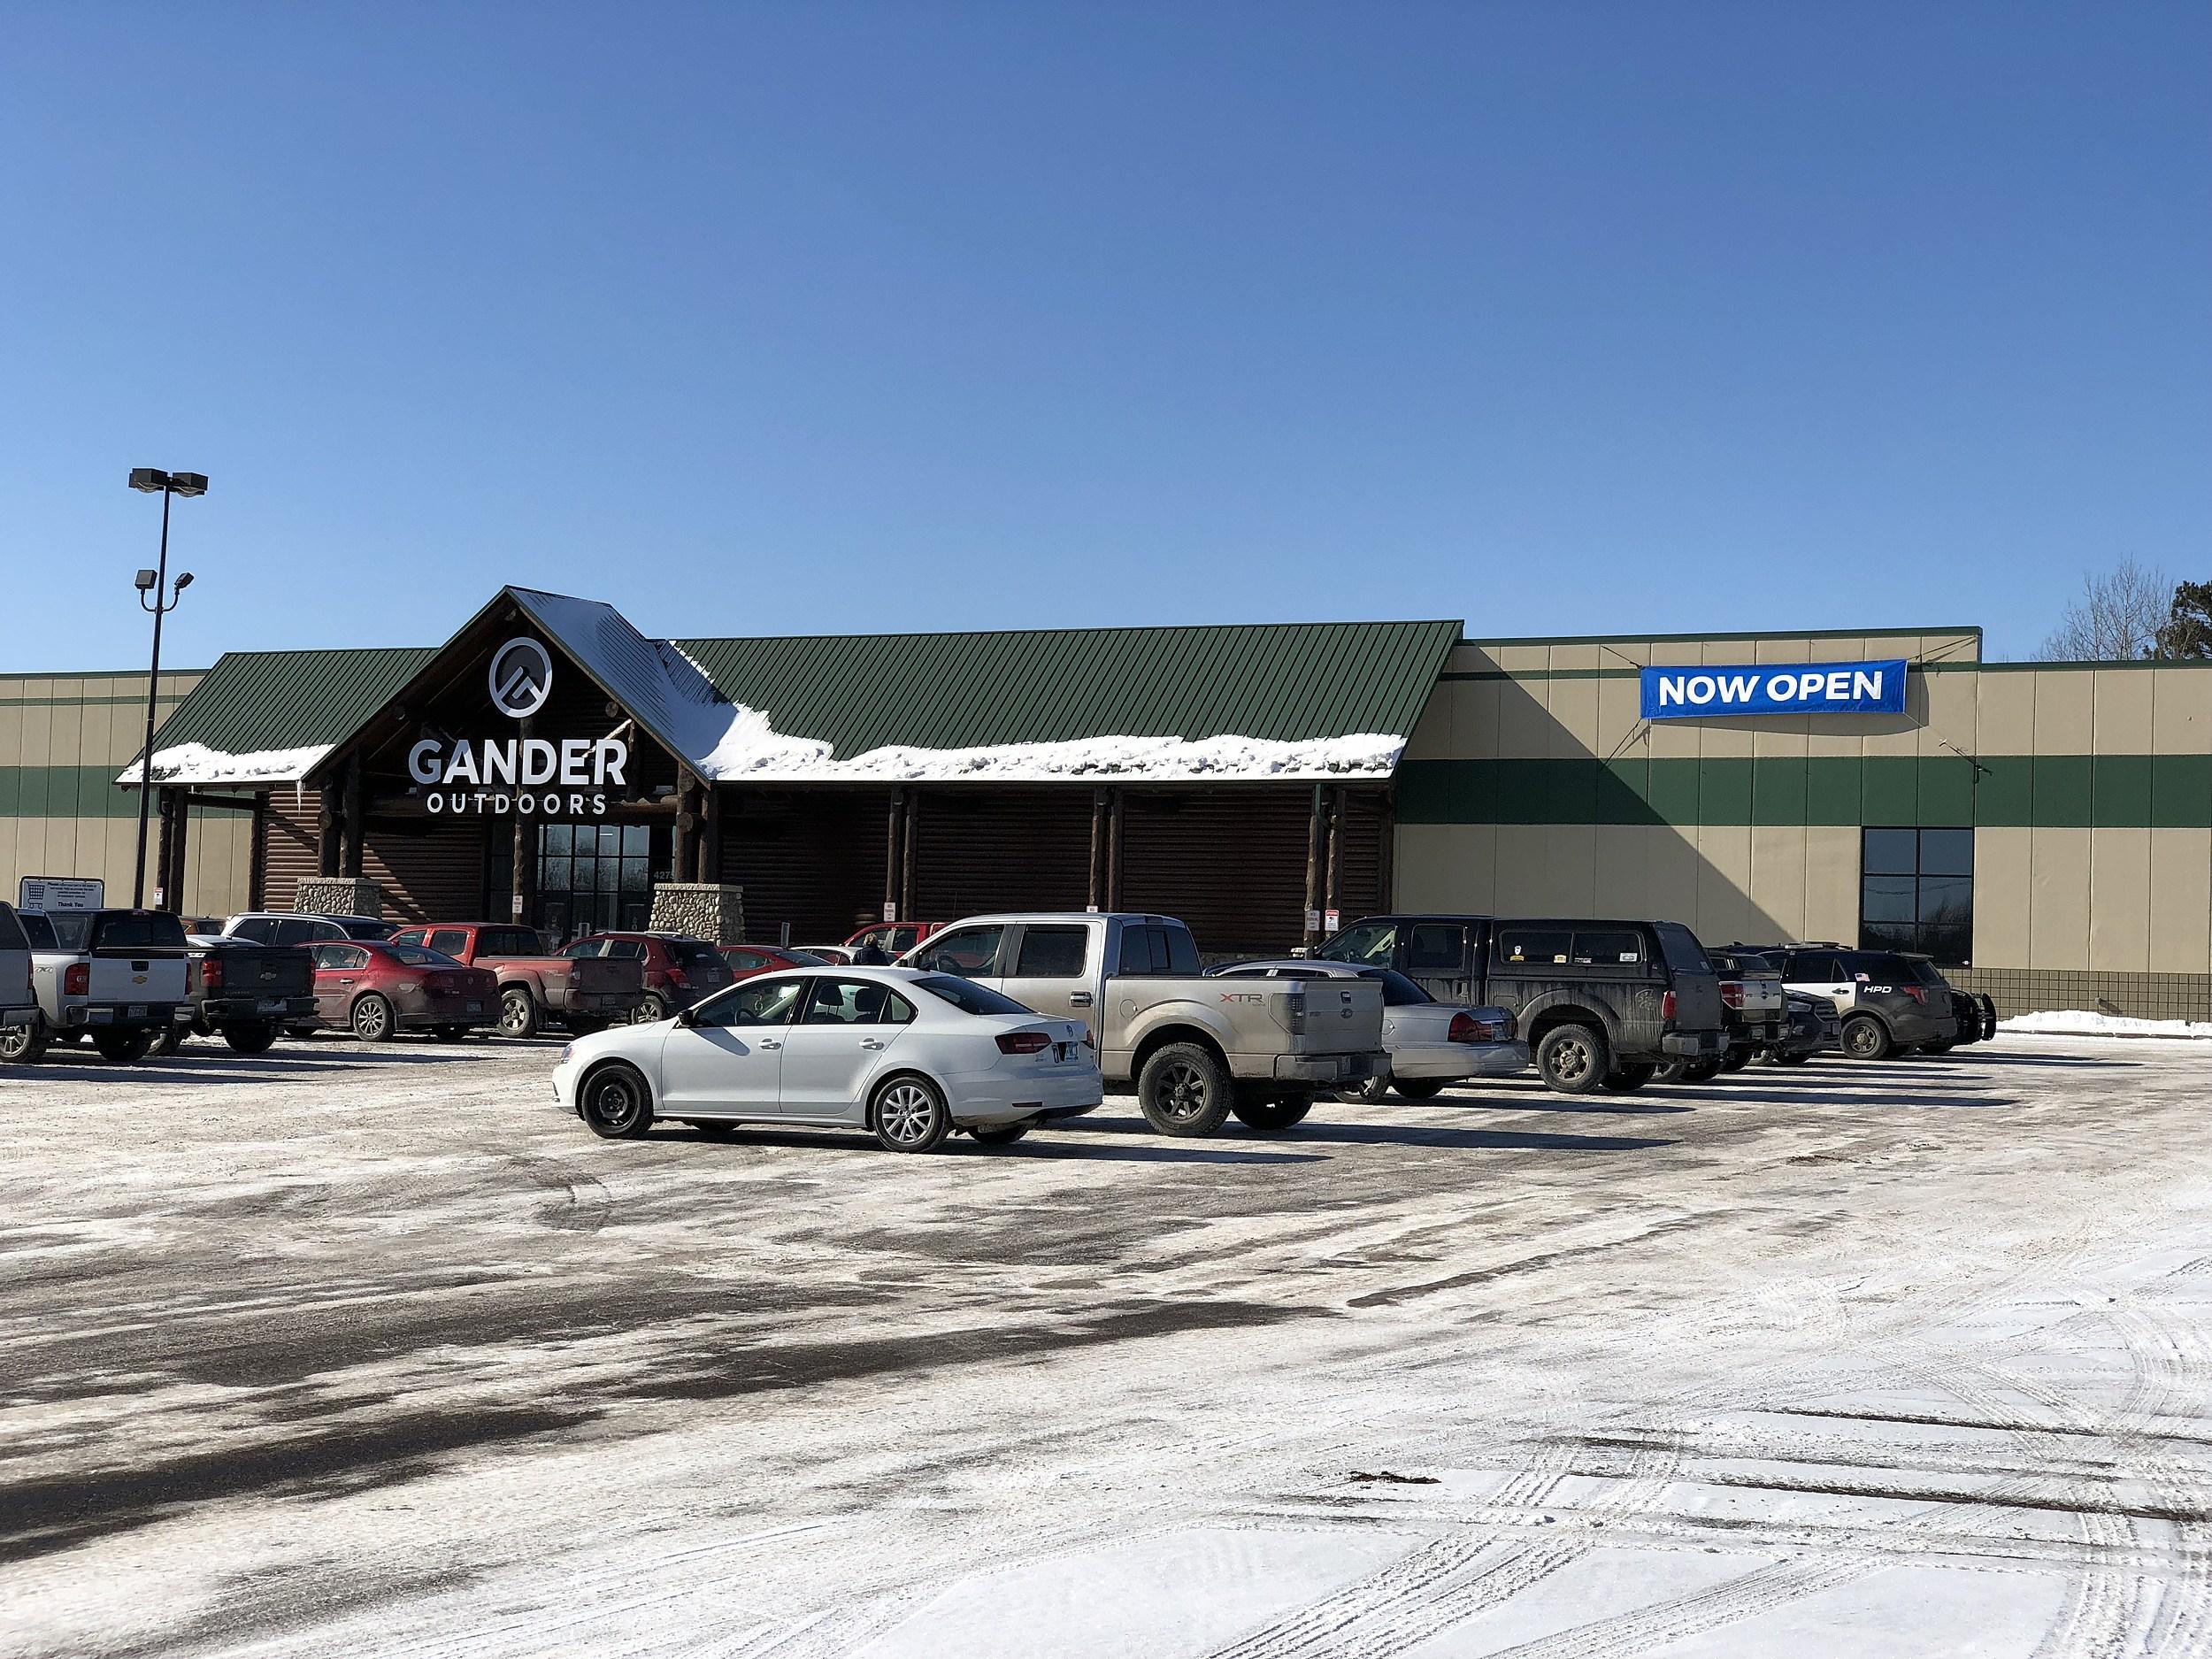 Gander Outdoors Closing 2 Minnesota 3 Wisconsin Store Locations